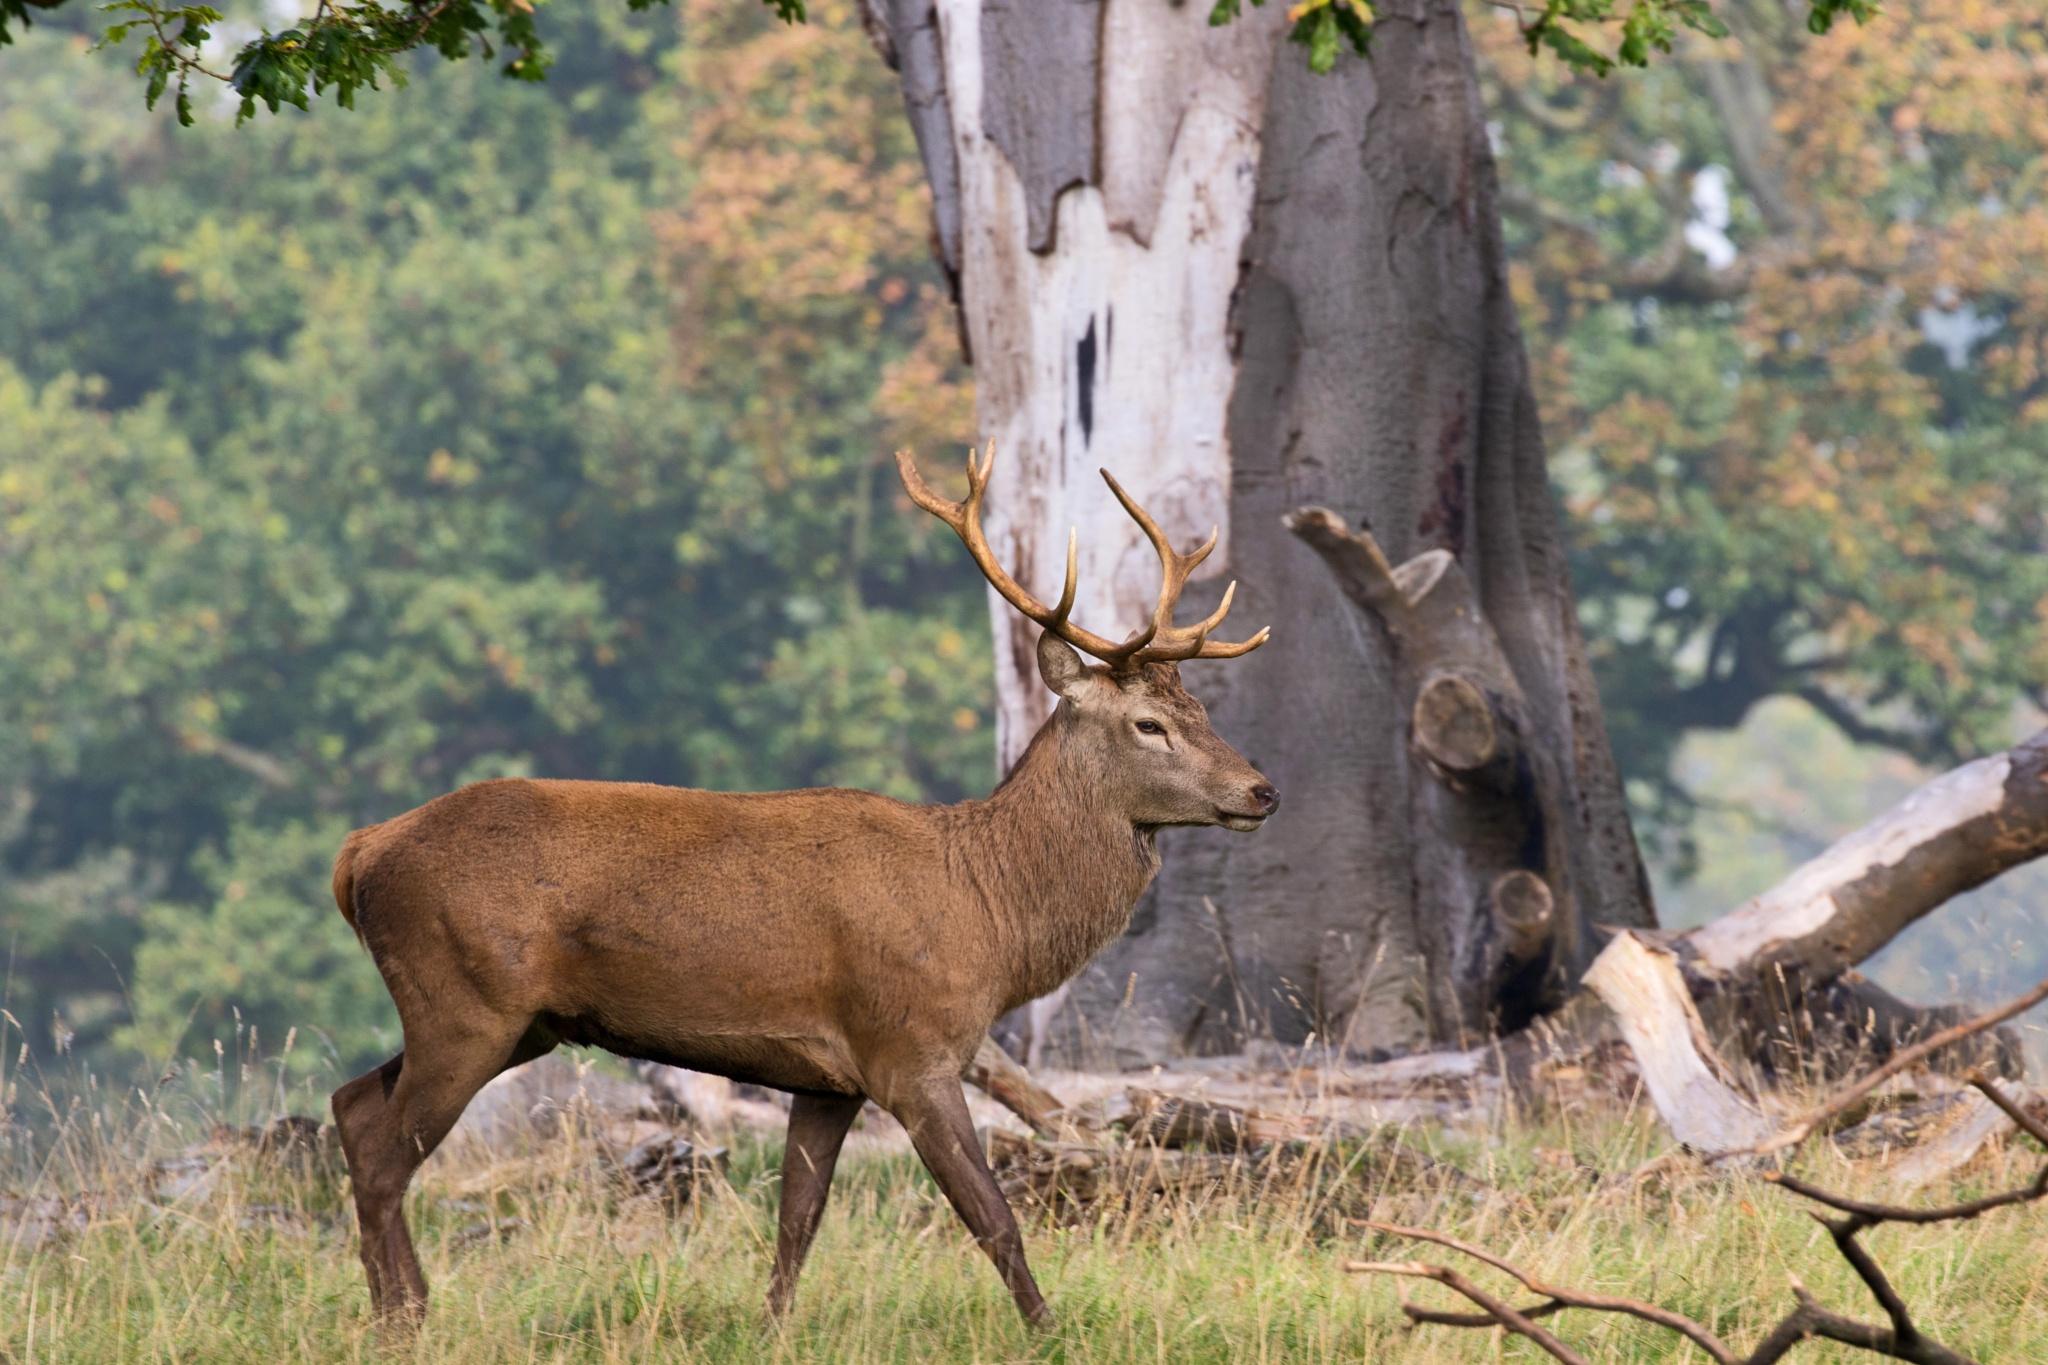 Buck Deer - Studley Royal,UK. by Steve Gill